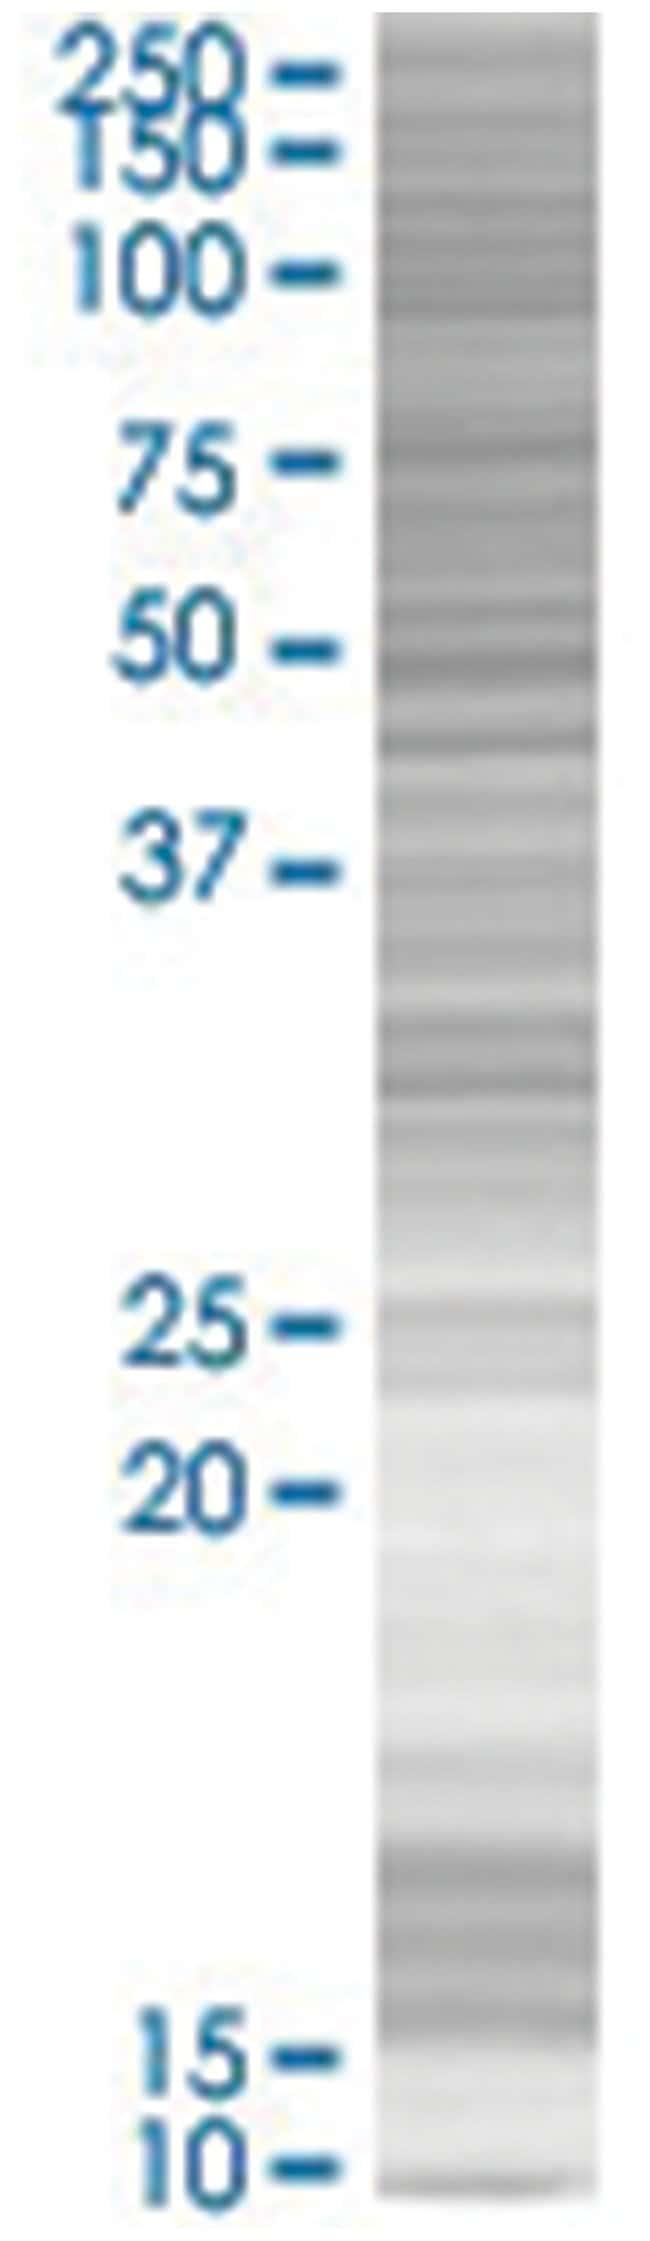 STOM 293T Cell Overexpression Lysate (Denatured), Abnova 100µL:Life